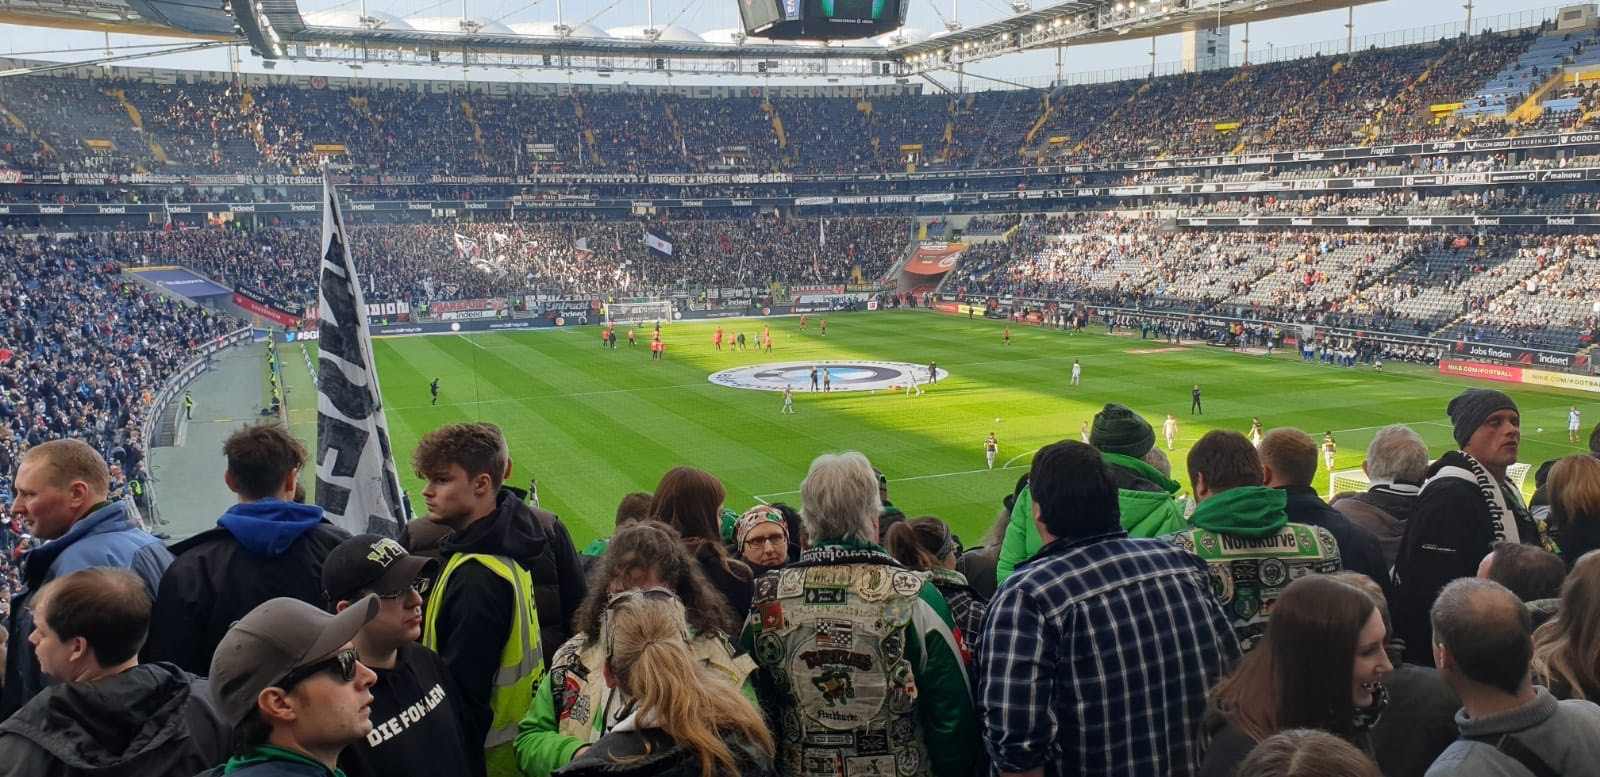 Stadio Frankfurt – Bild: Dirk Dahmen